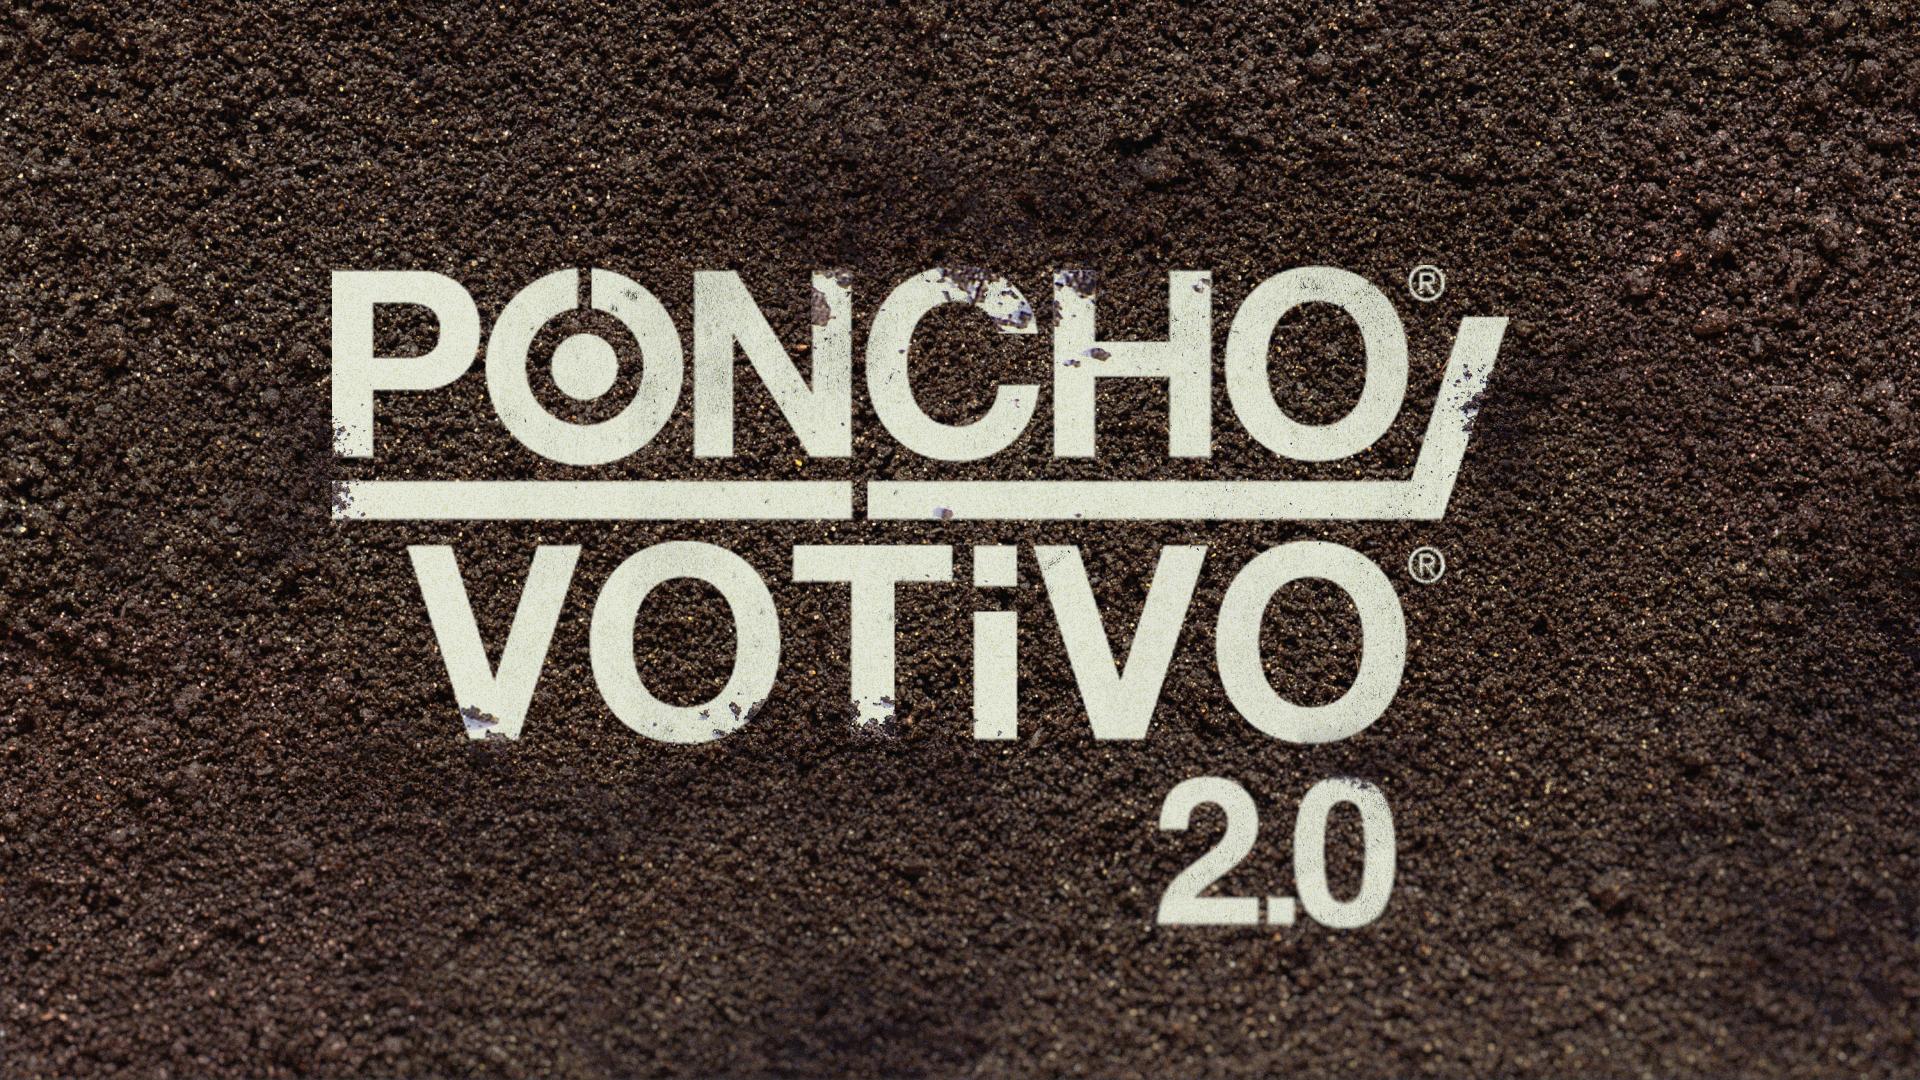 Poncho_Votivo.png